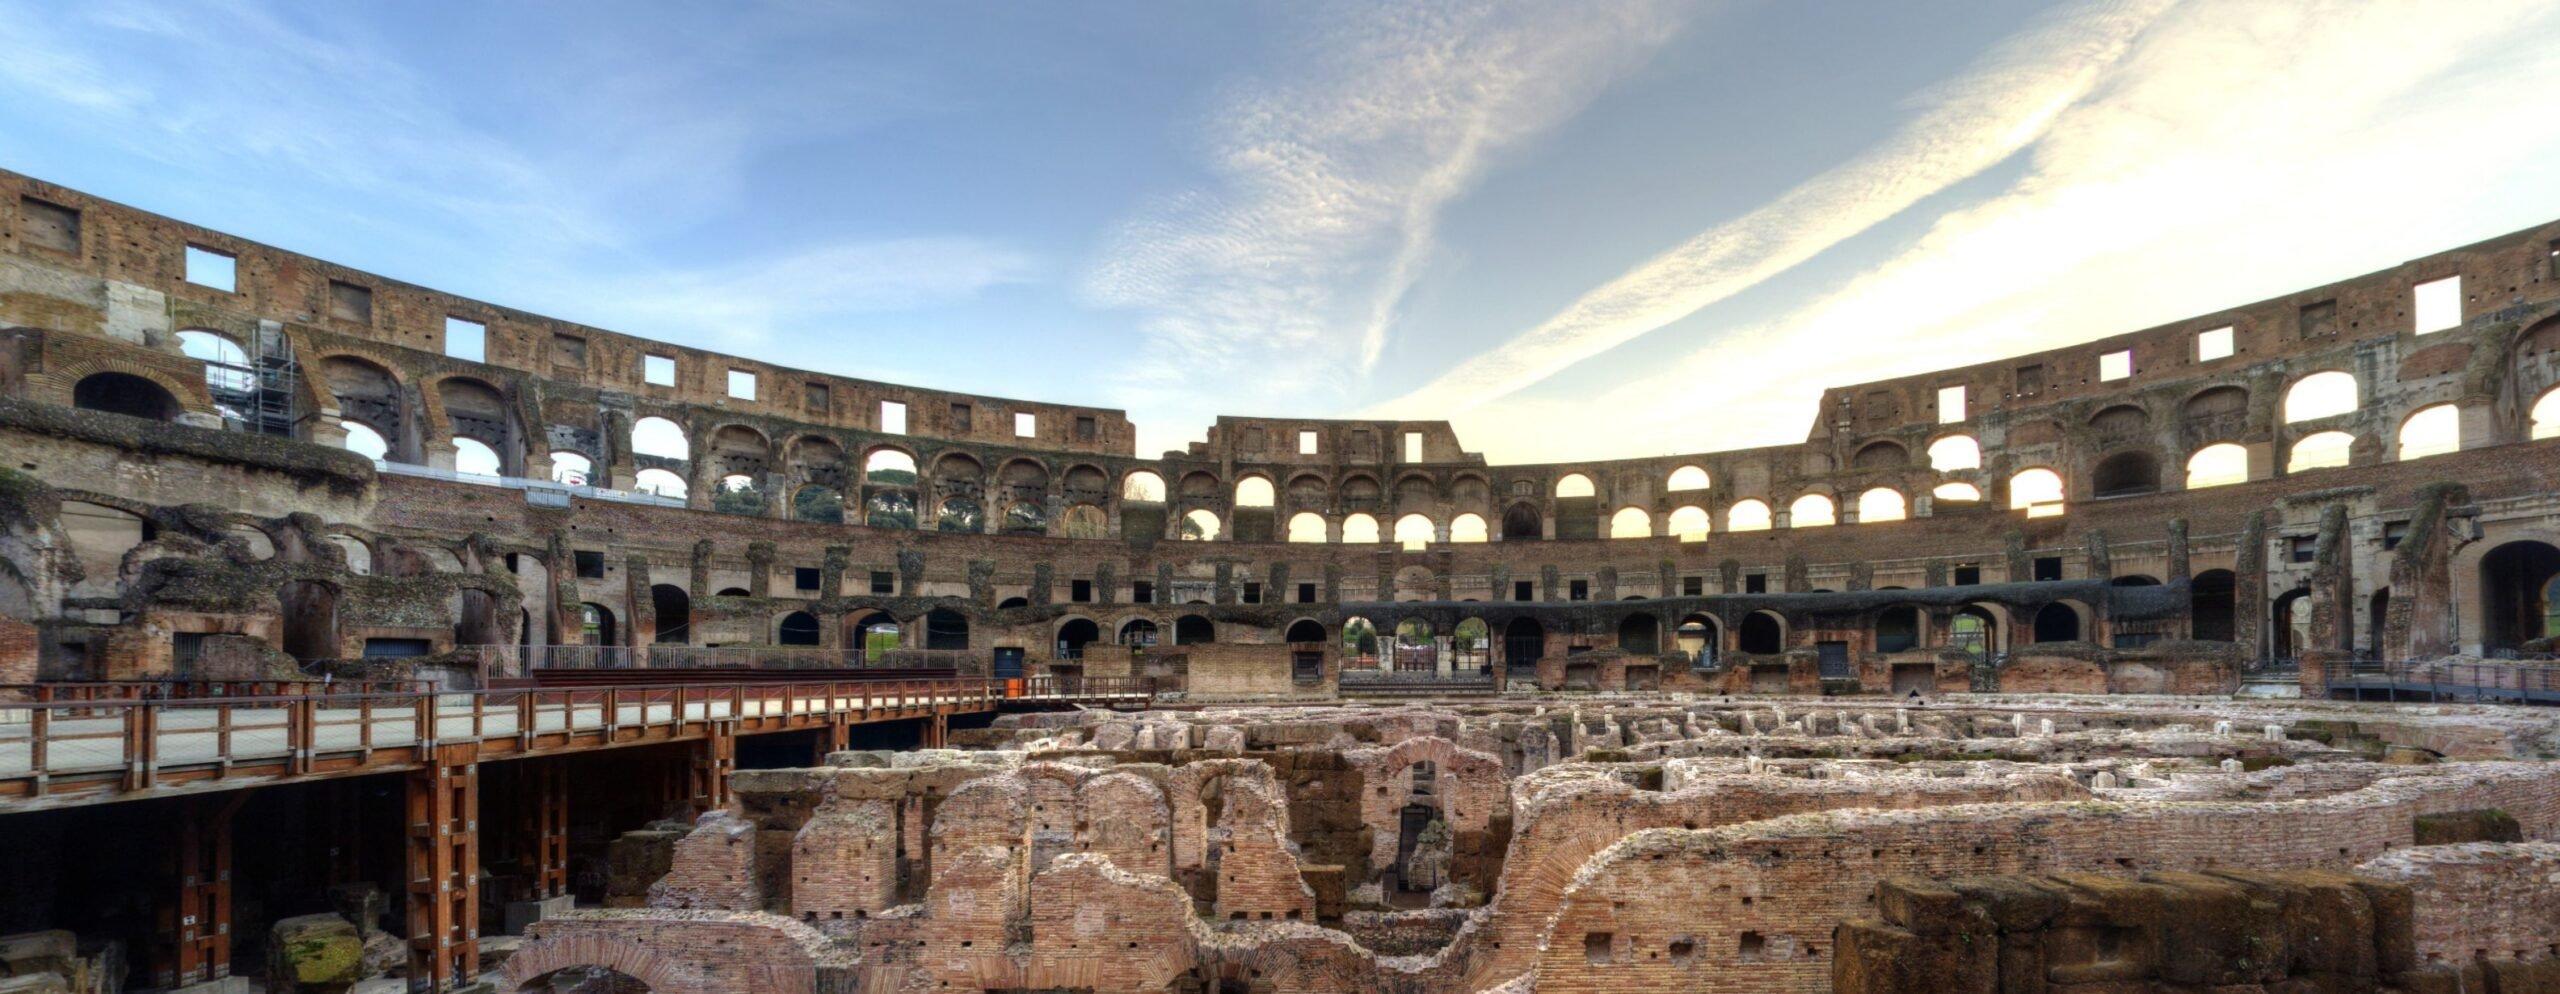 LIVE Culture CoopCulture, Colosseo